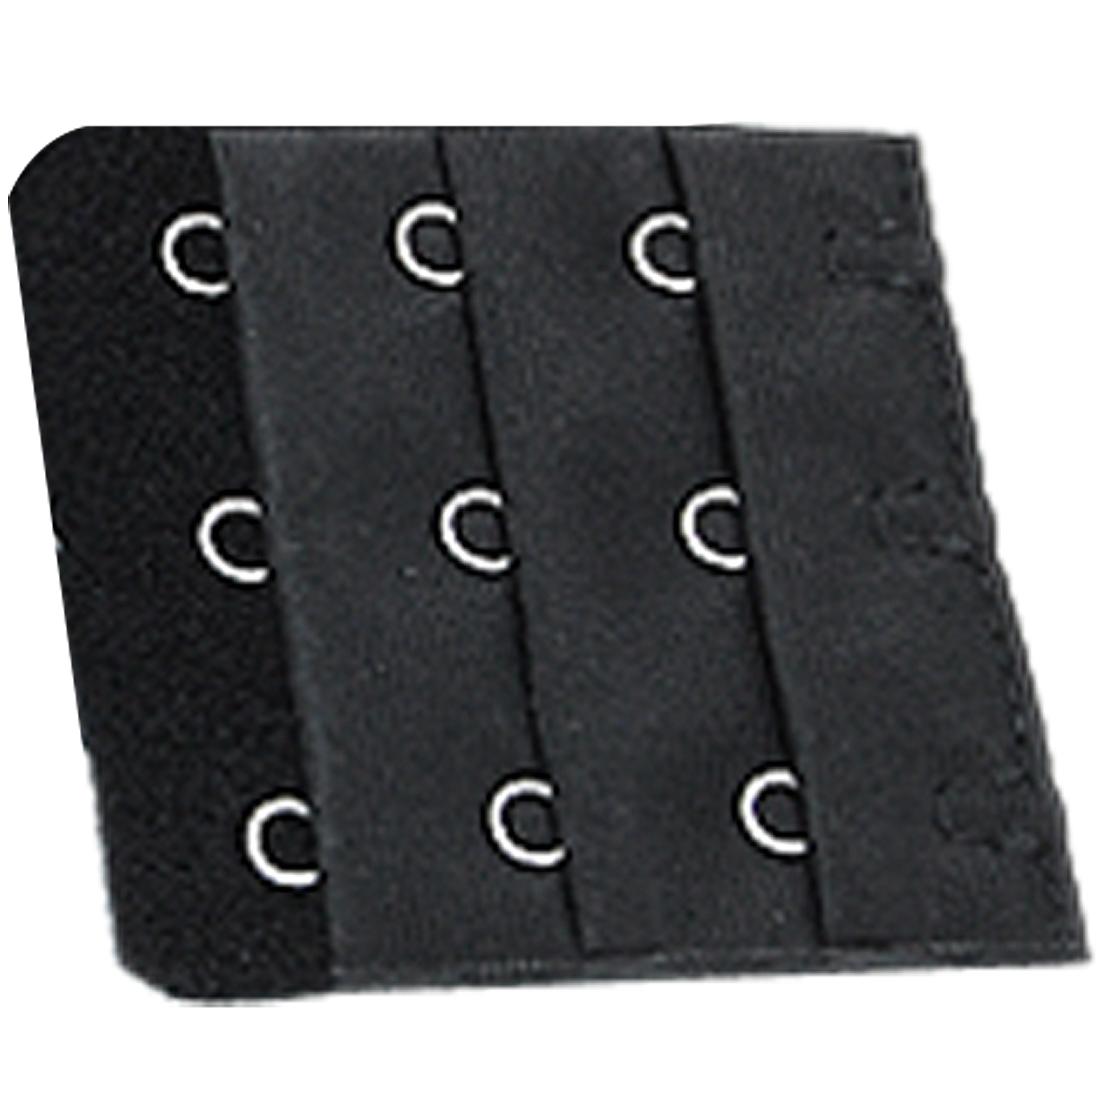 5 Pcs Black Bra Extenders 3 Hooks Strap Lingerie Set